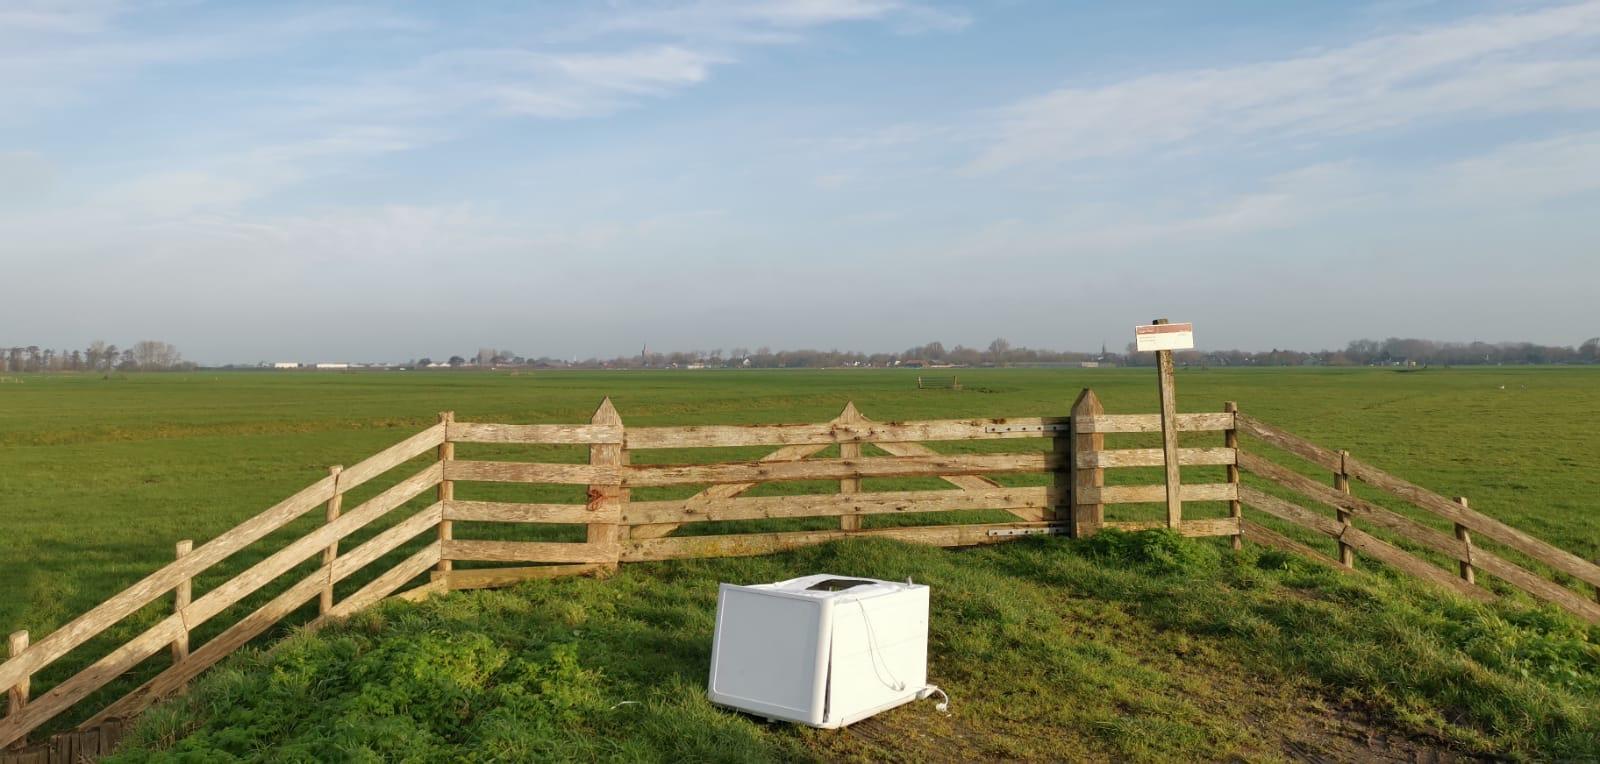 Burgemeester van Opmeer hekelt afvaldump in natuurgebied. 'Op basis van kenteken dader opsporen met camera'